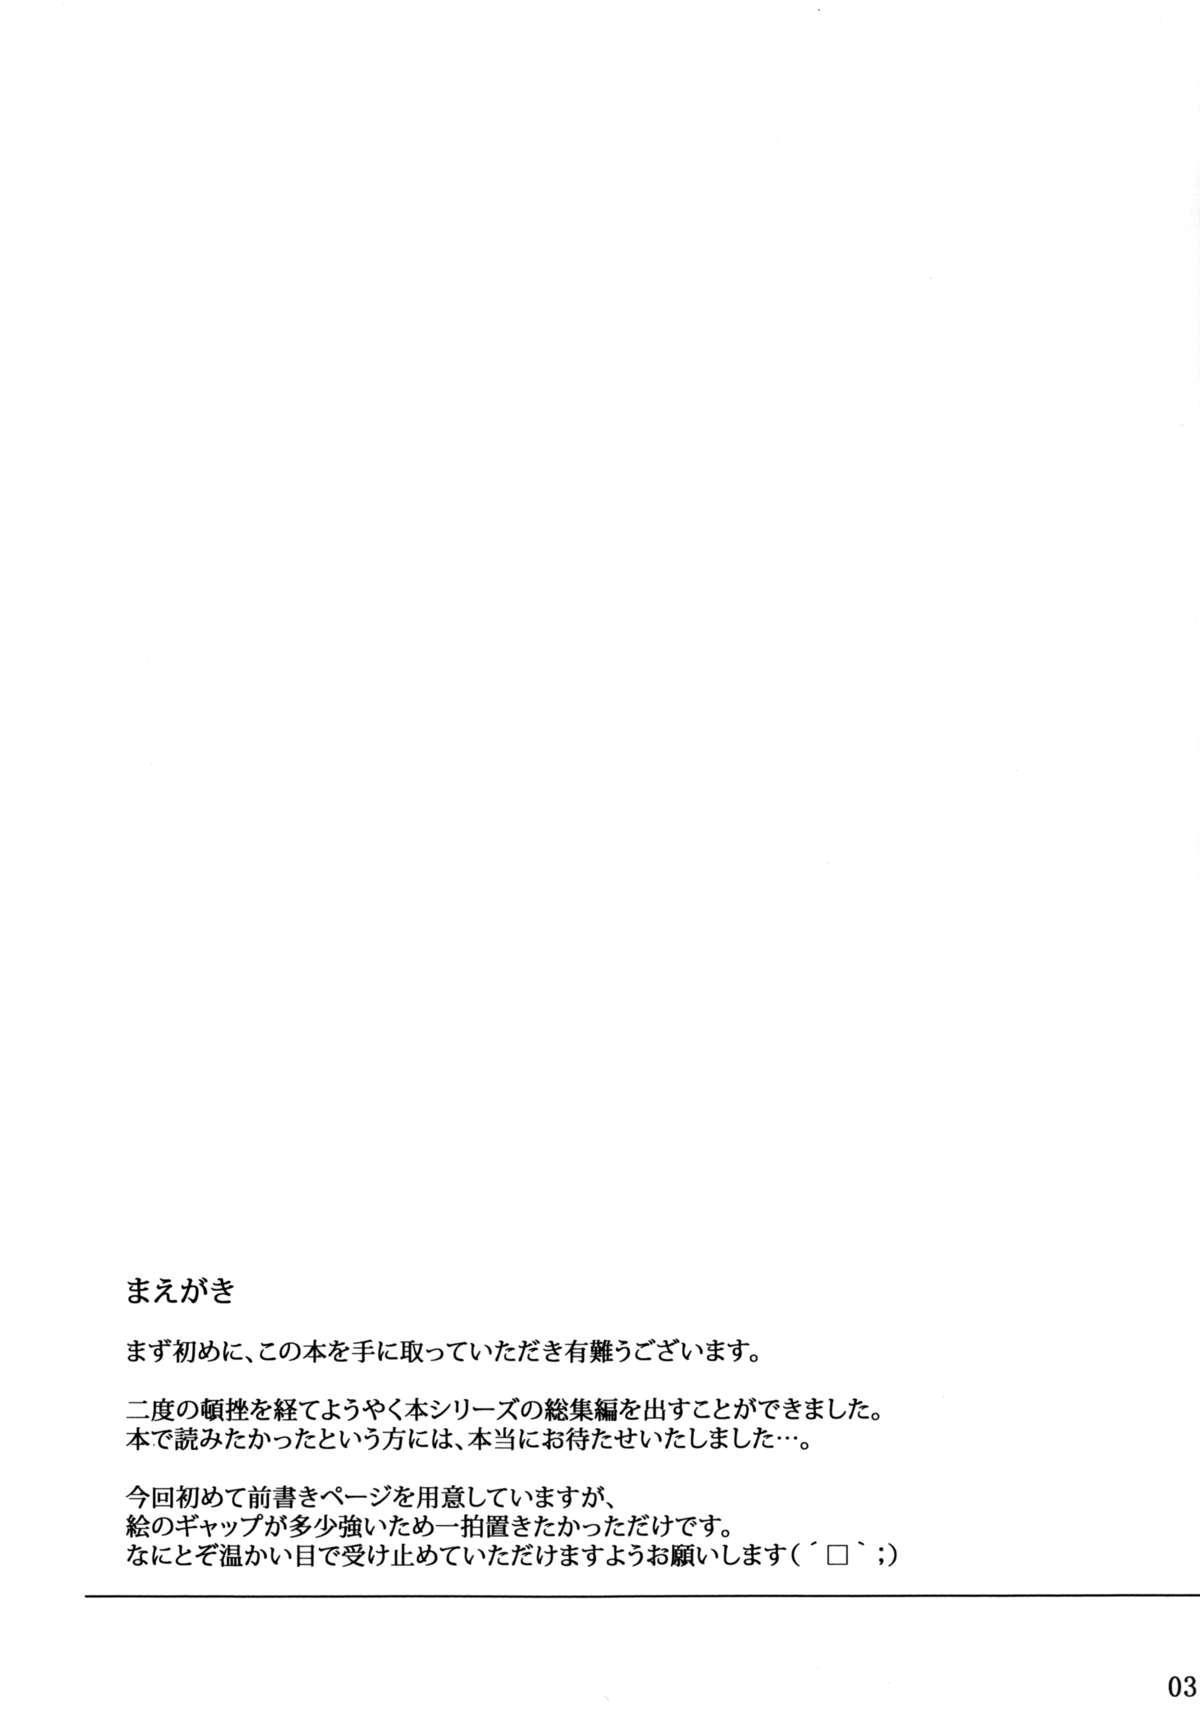 Tosaka-ke no Kakei Jijou Soushuuhen 1 2